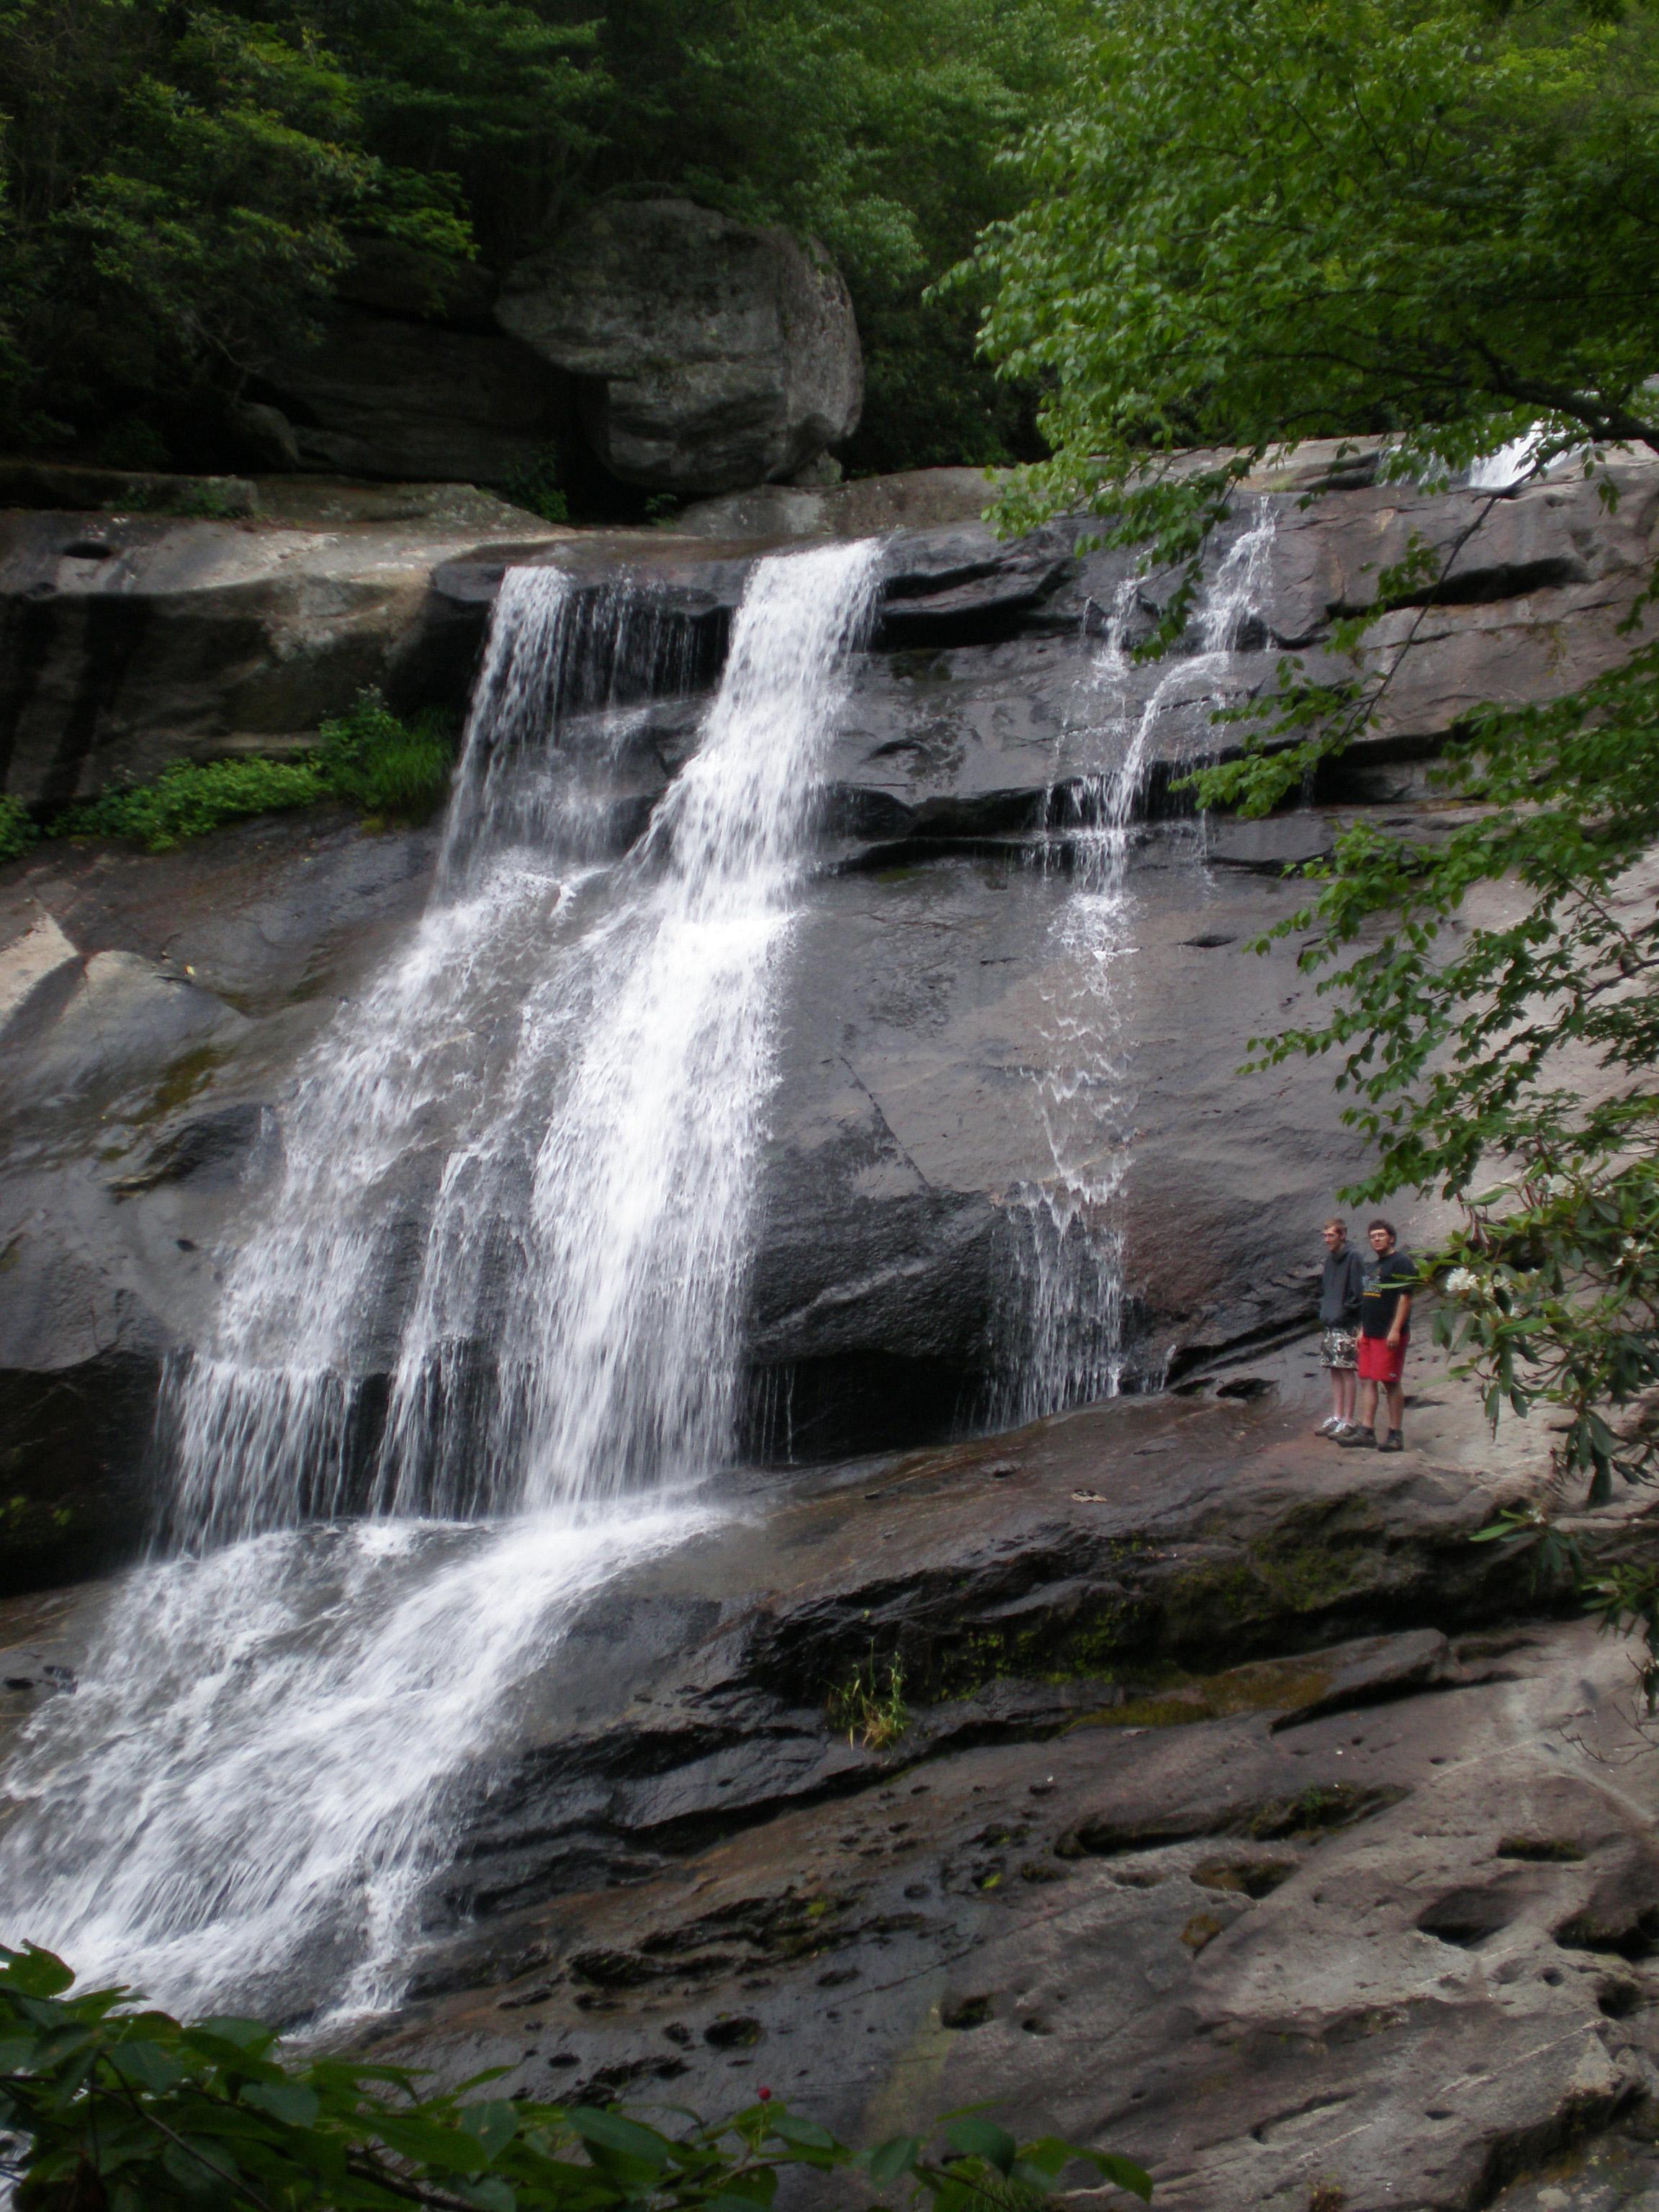 Waterfall near Blowing Rock, NC